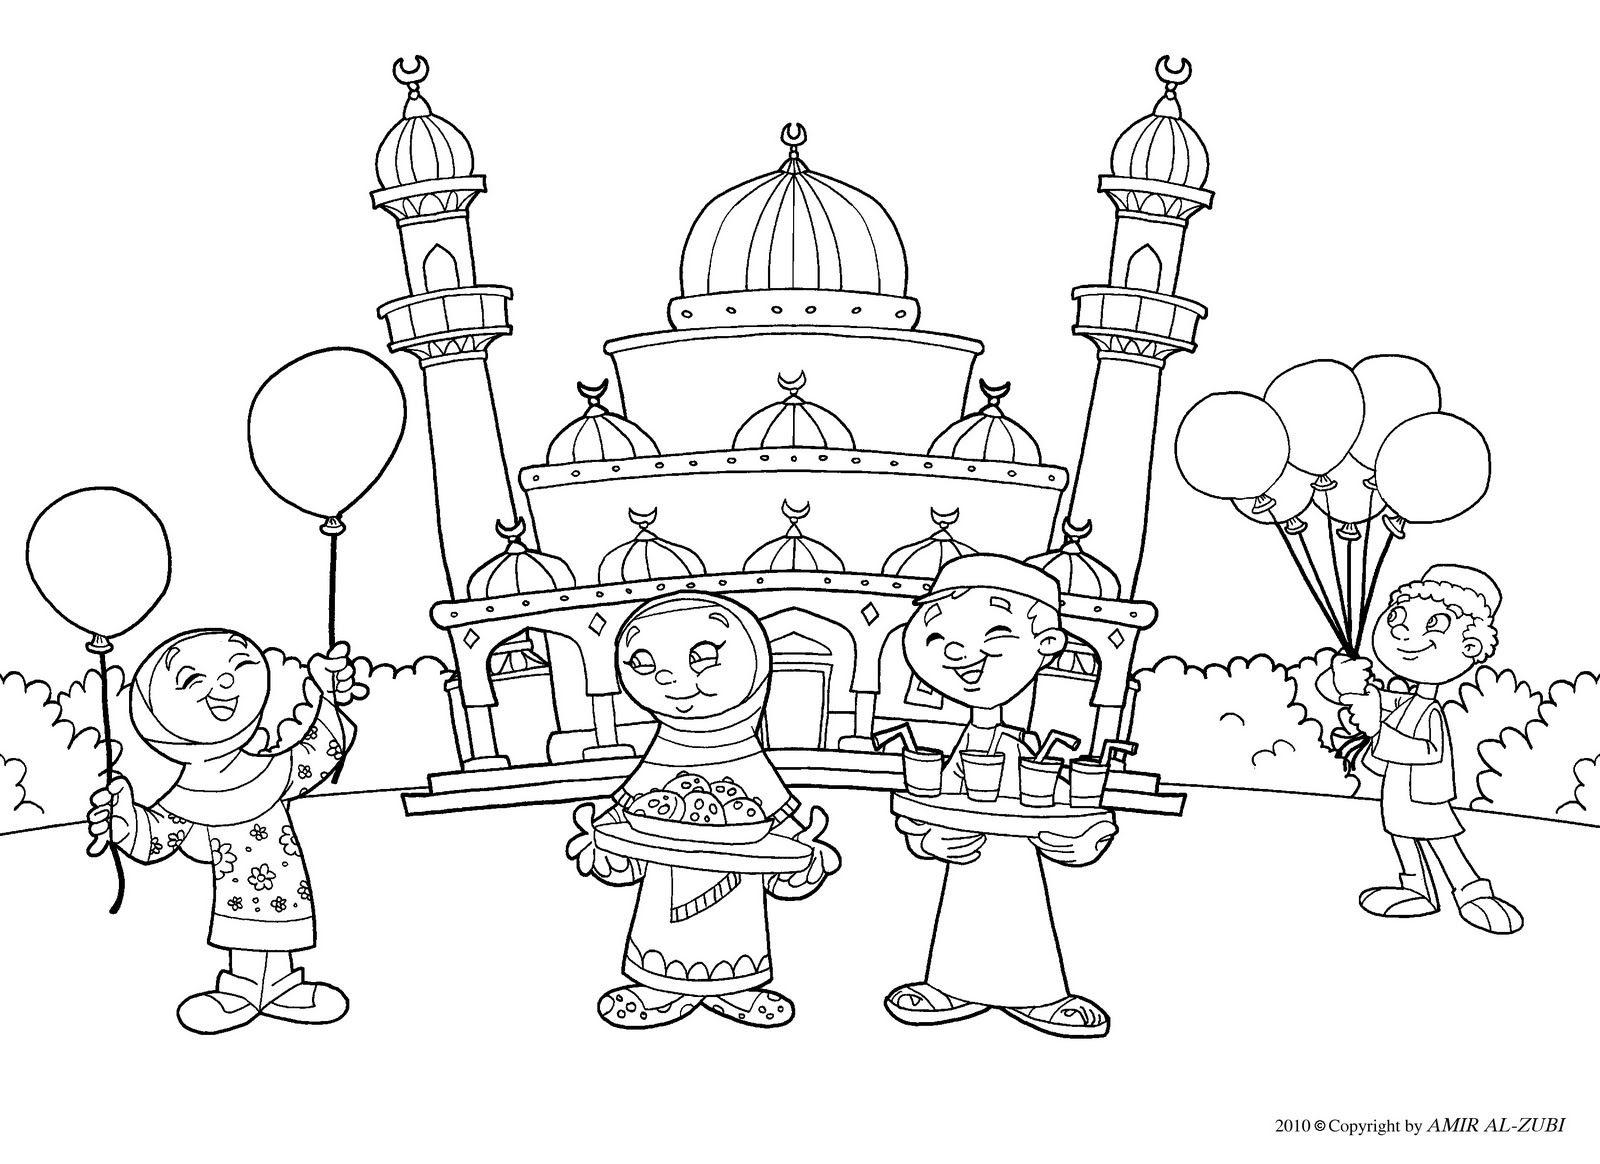 Super Hros Musulmancolouringcoloriage Kids Enfants